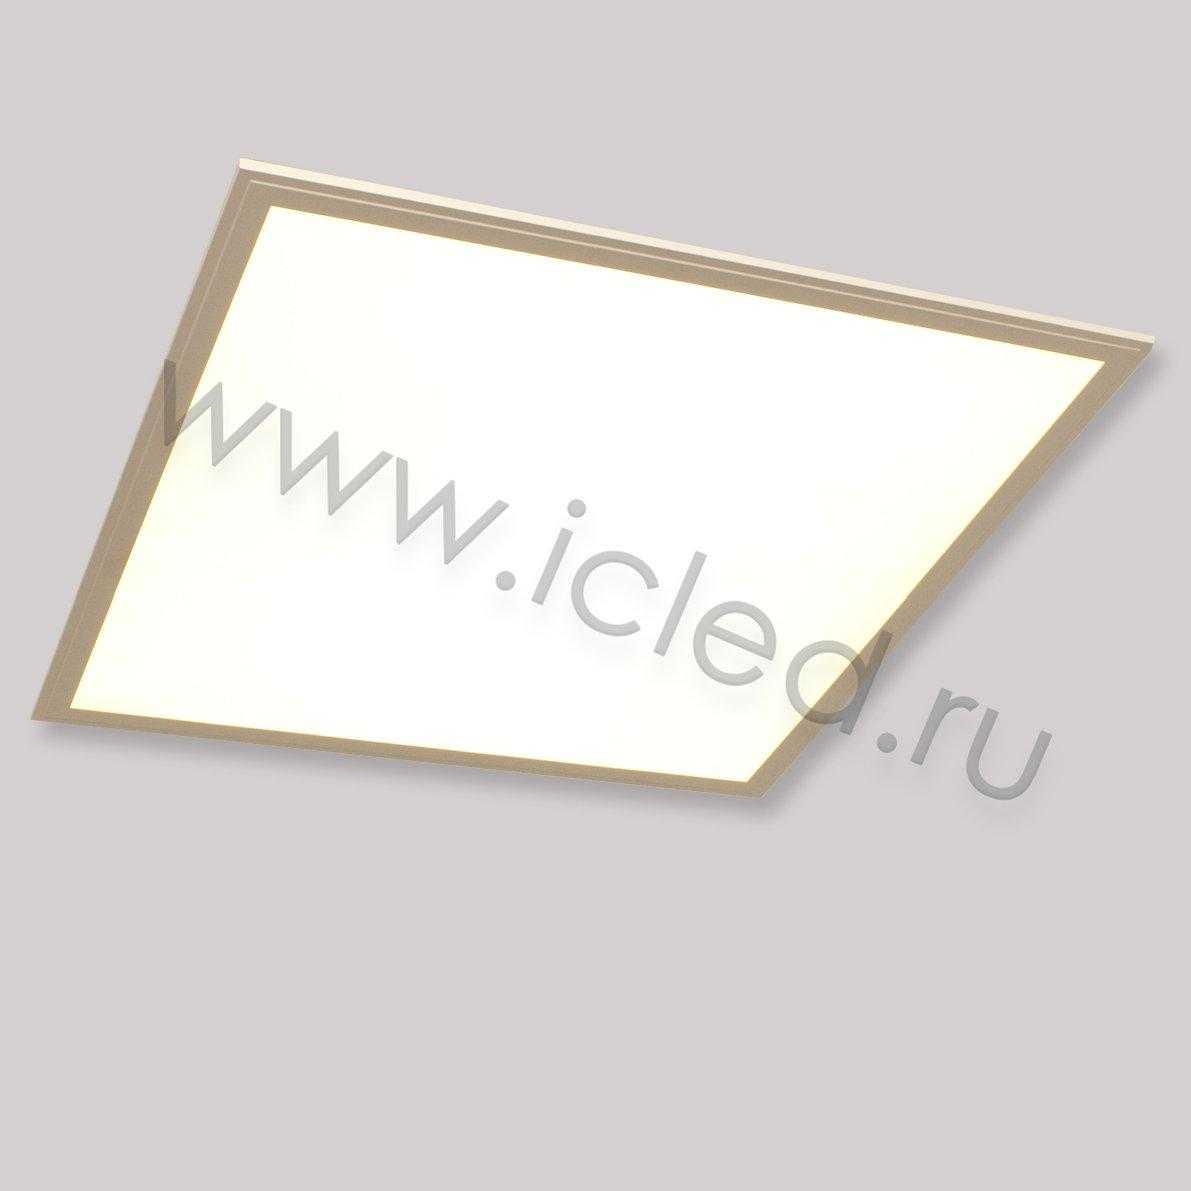 Светодиодная панель S L600 2440Lm (42W, 220V, Warm White)